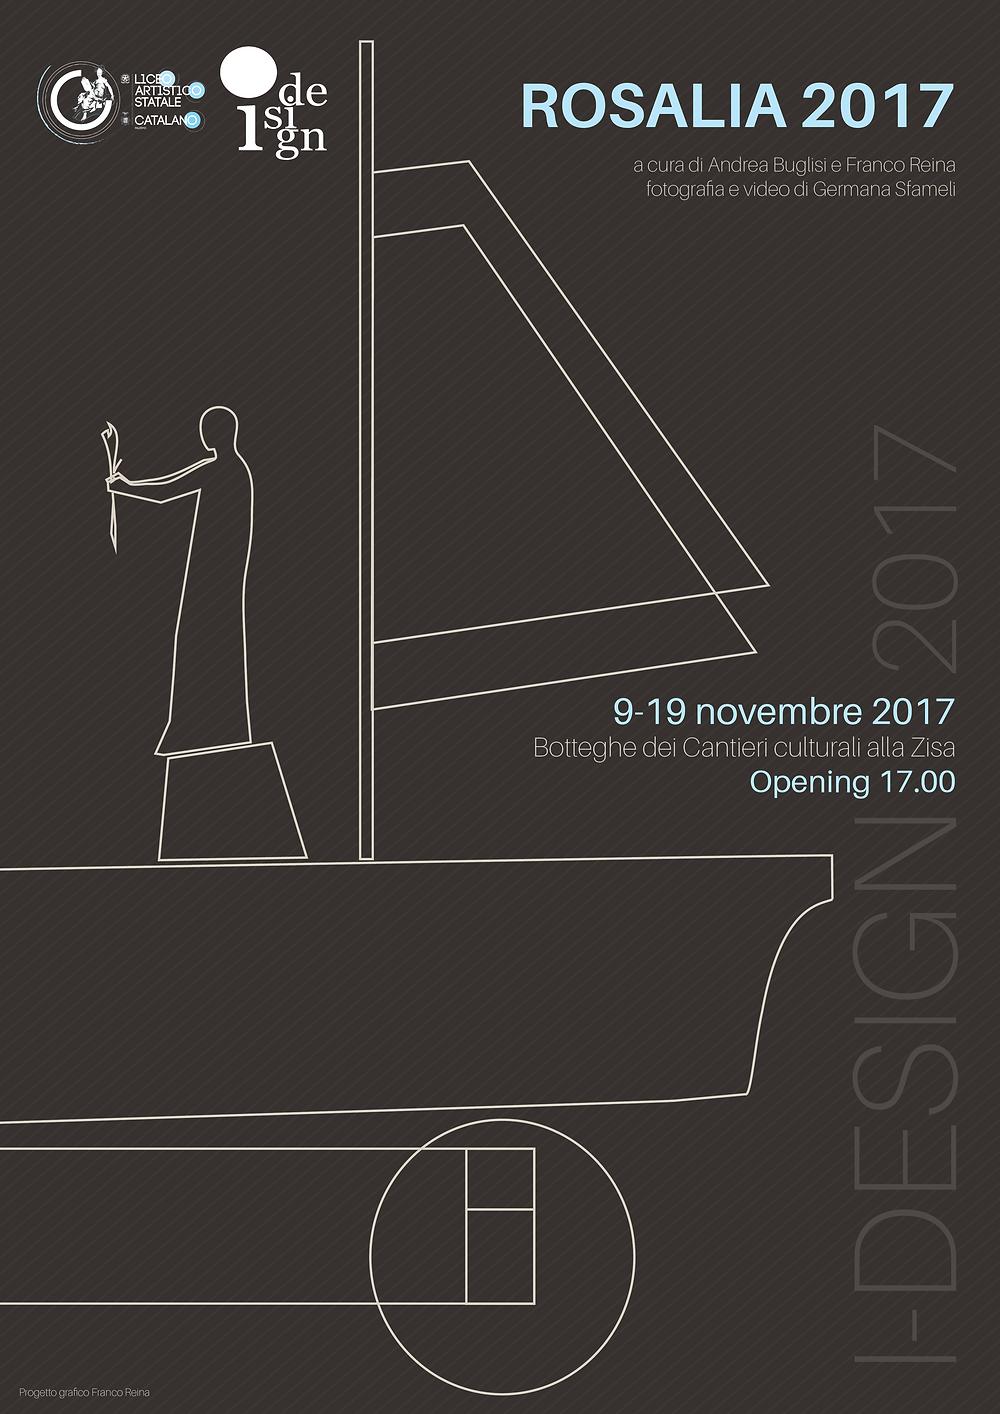 ROSALIA 2017 - I-DESIGN